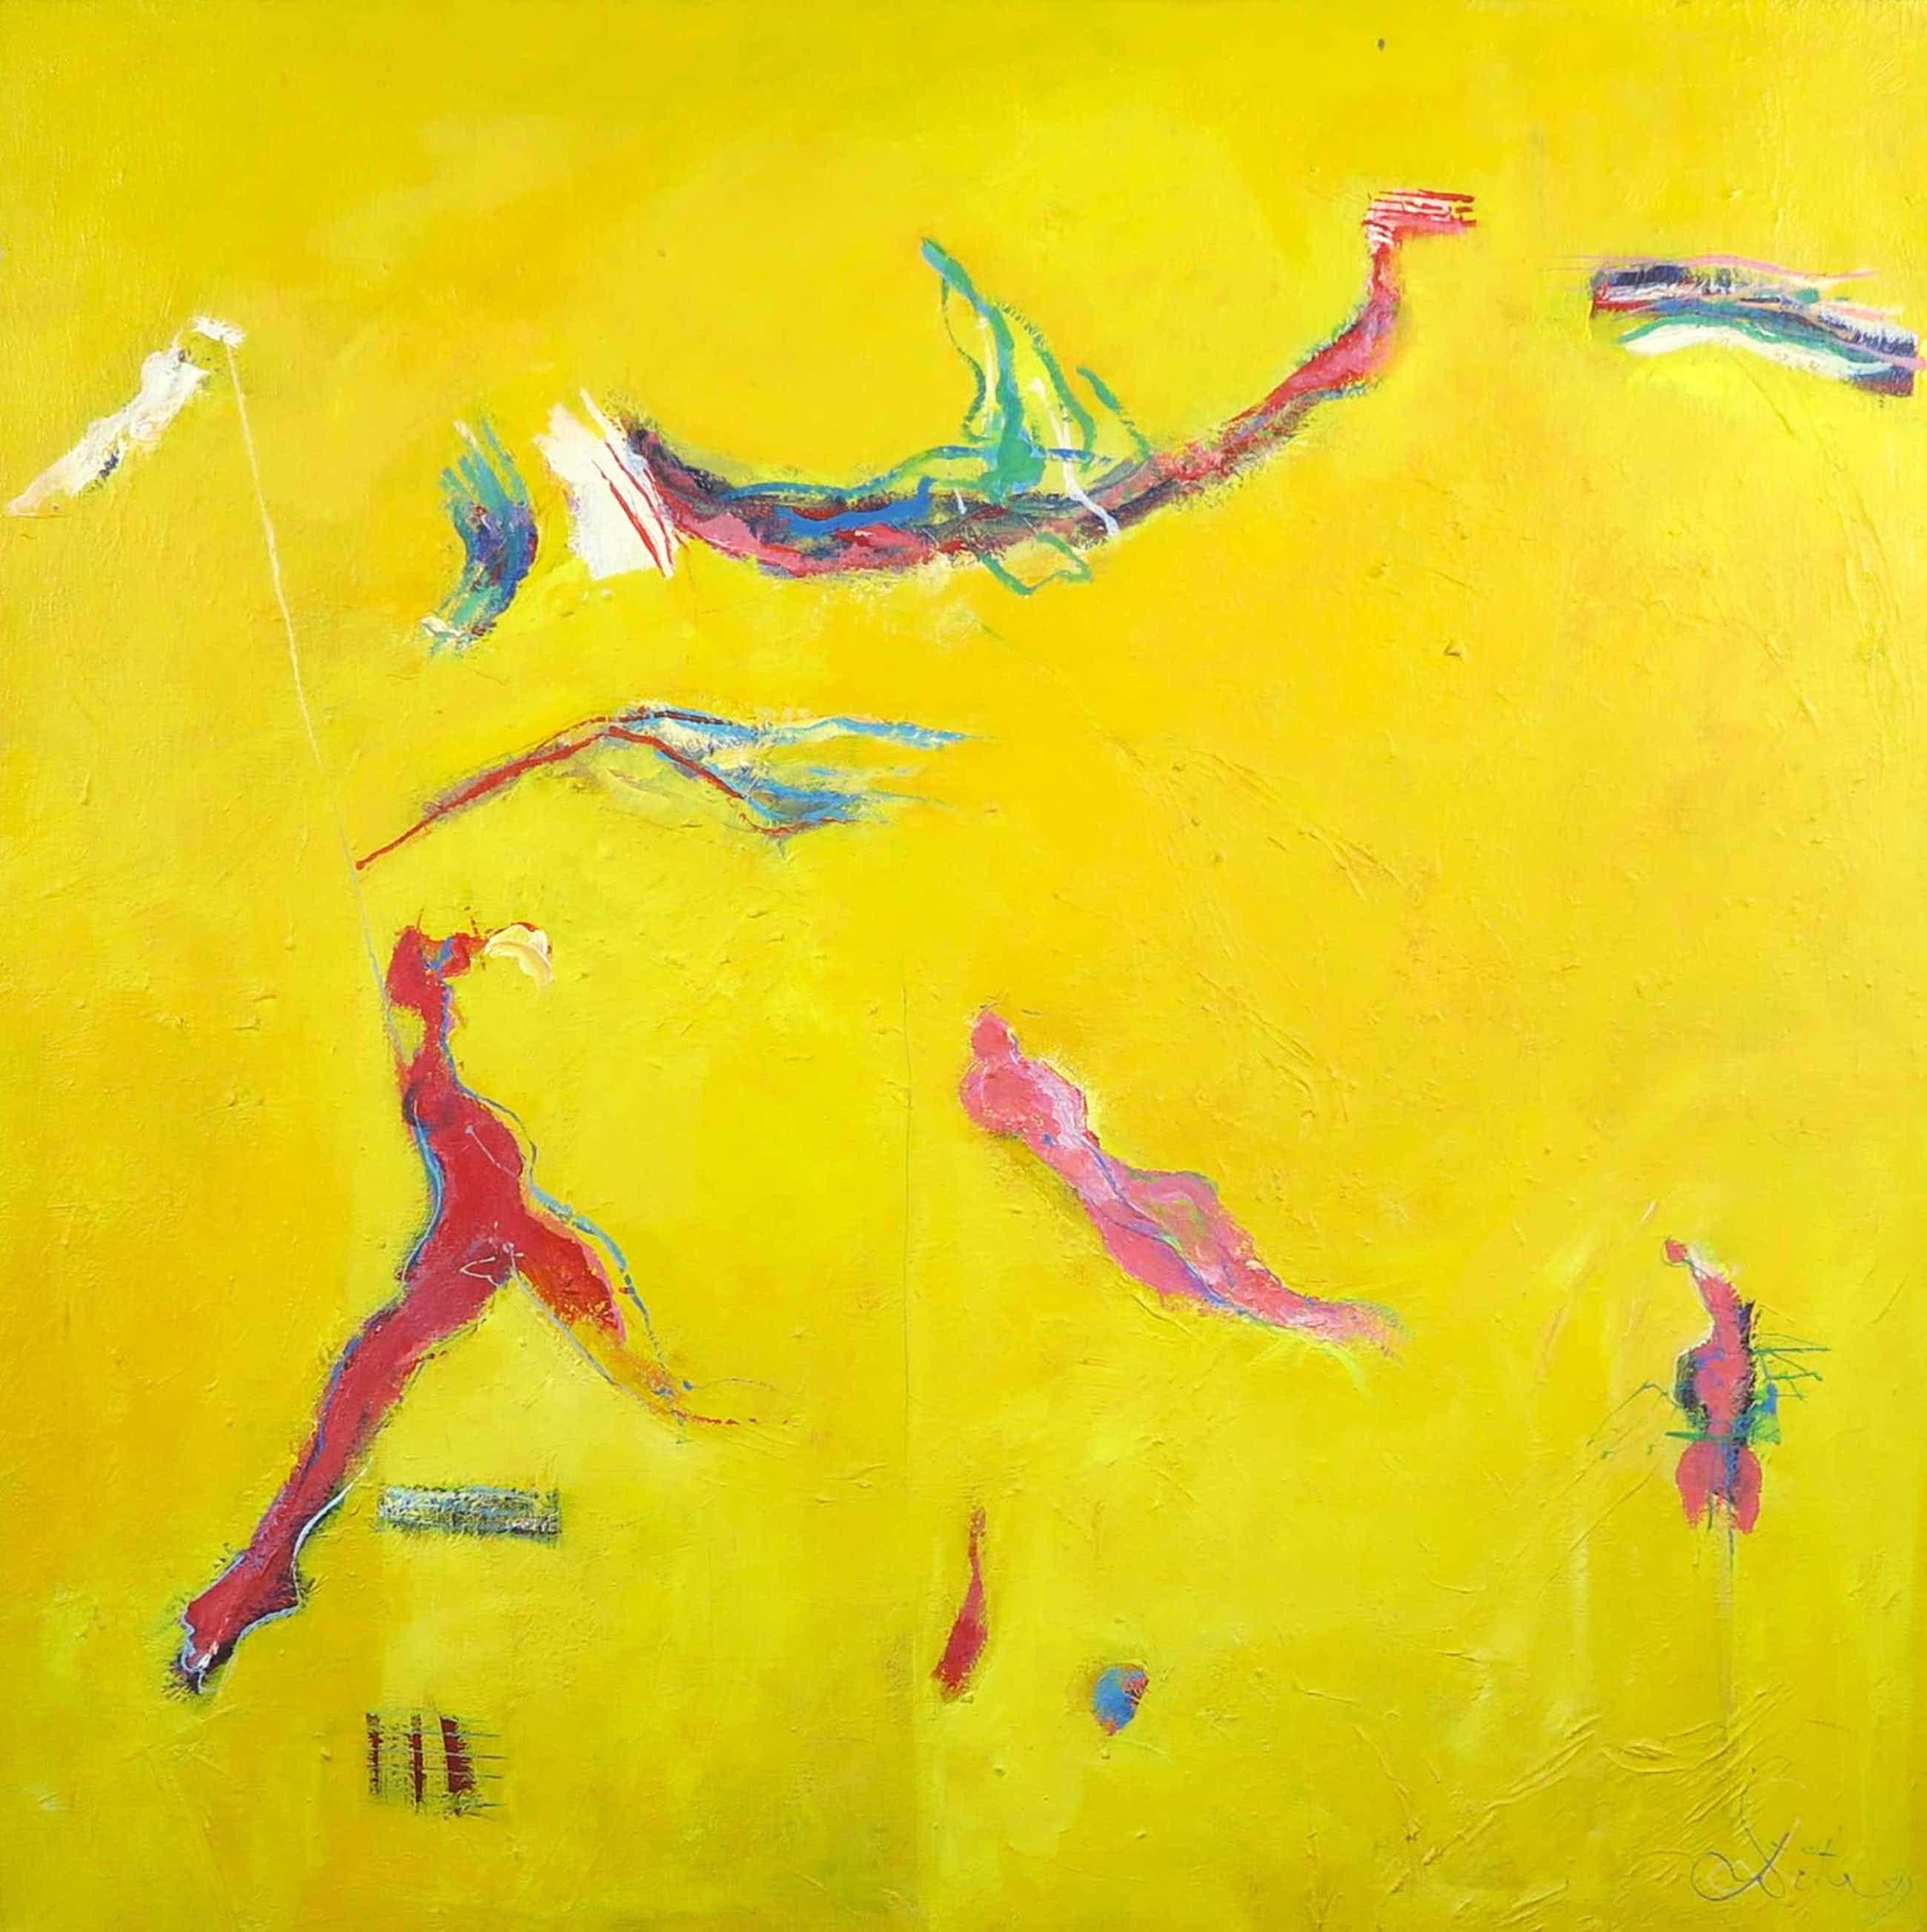 Franscz Witte - Olieverf op doek, Dansende beweging kopen? Bied vanaf 95!